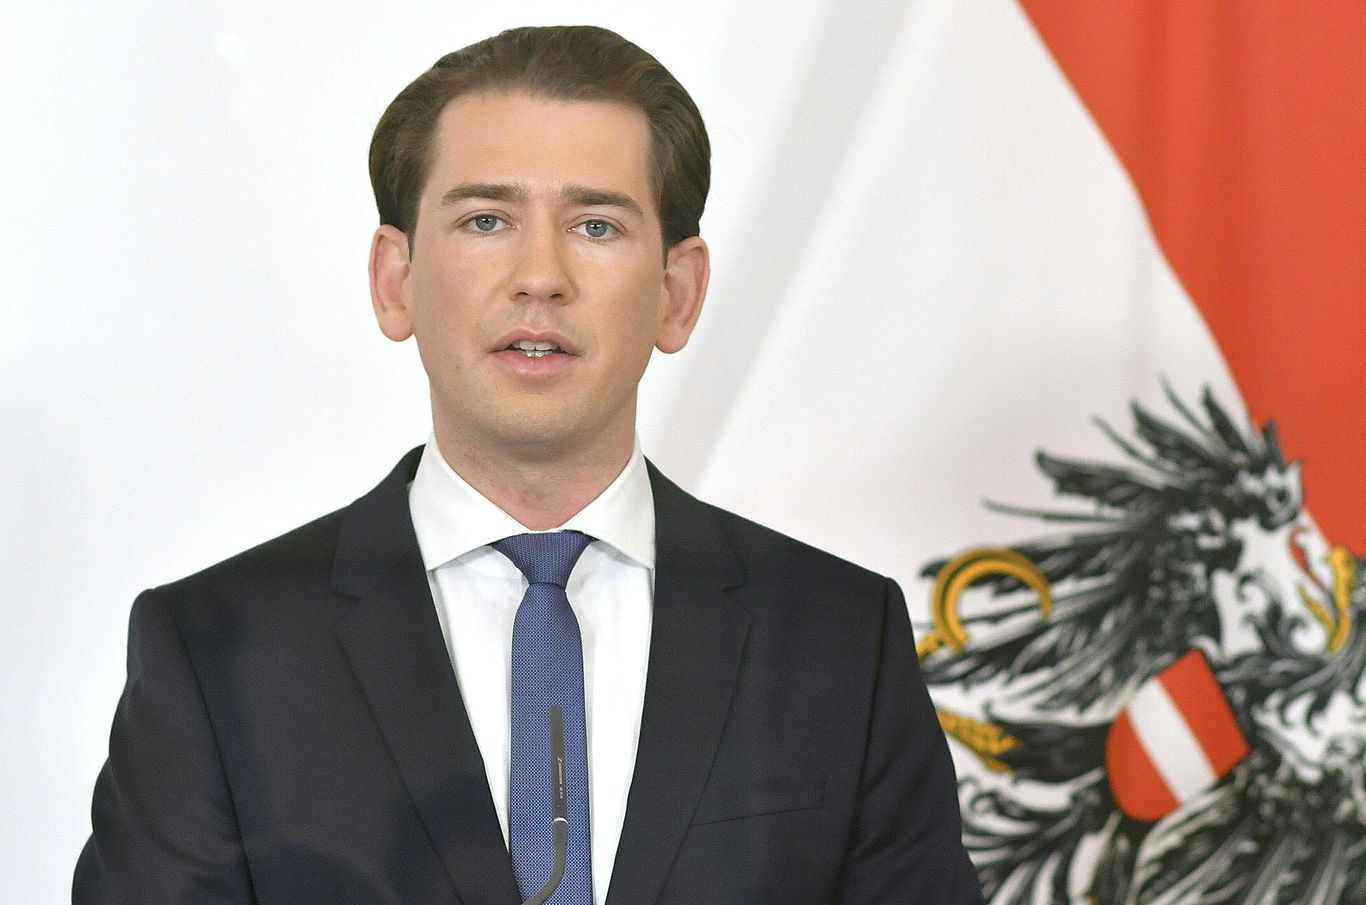 Austria announces nationwide lockdown as COVID-19 cases soar thumbnail